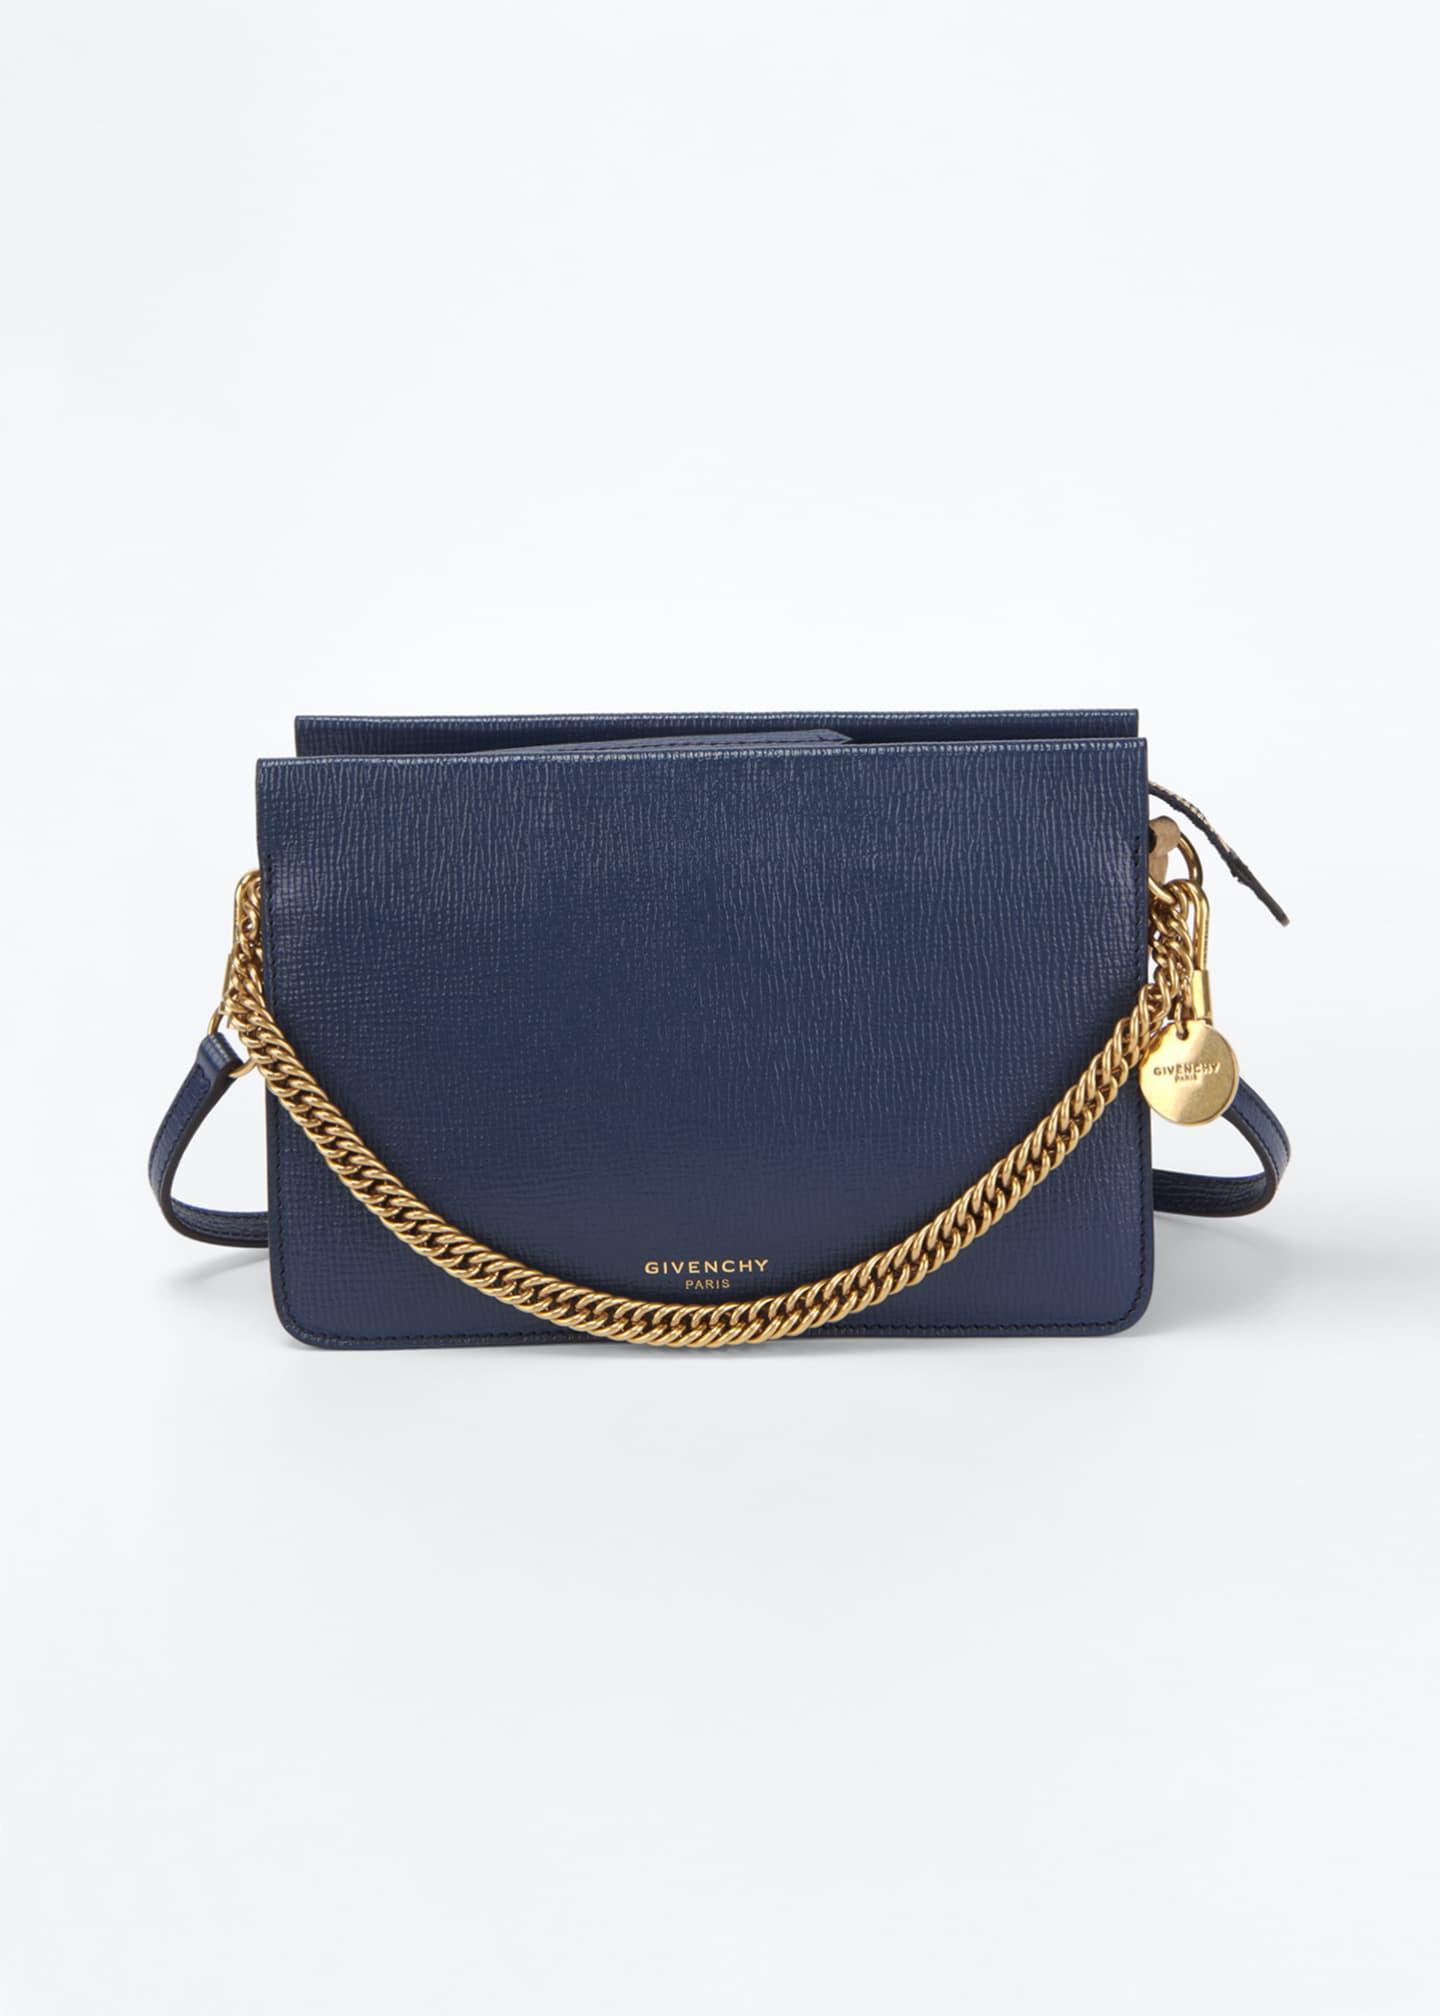 Givenchy Cross3 Leather Crossbody Bag